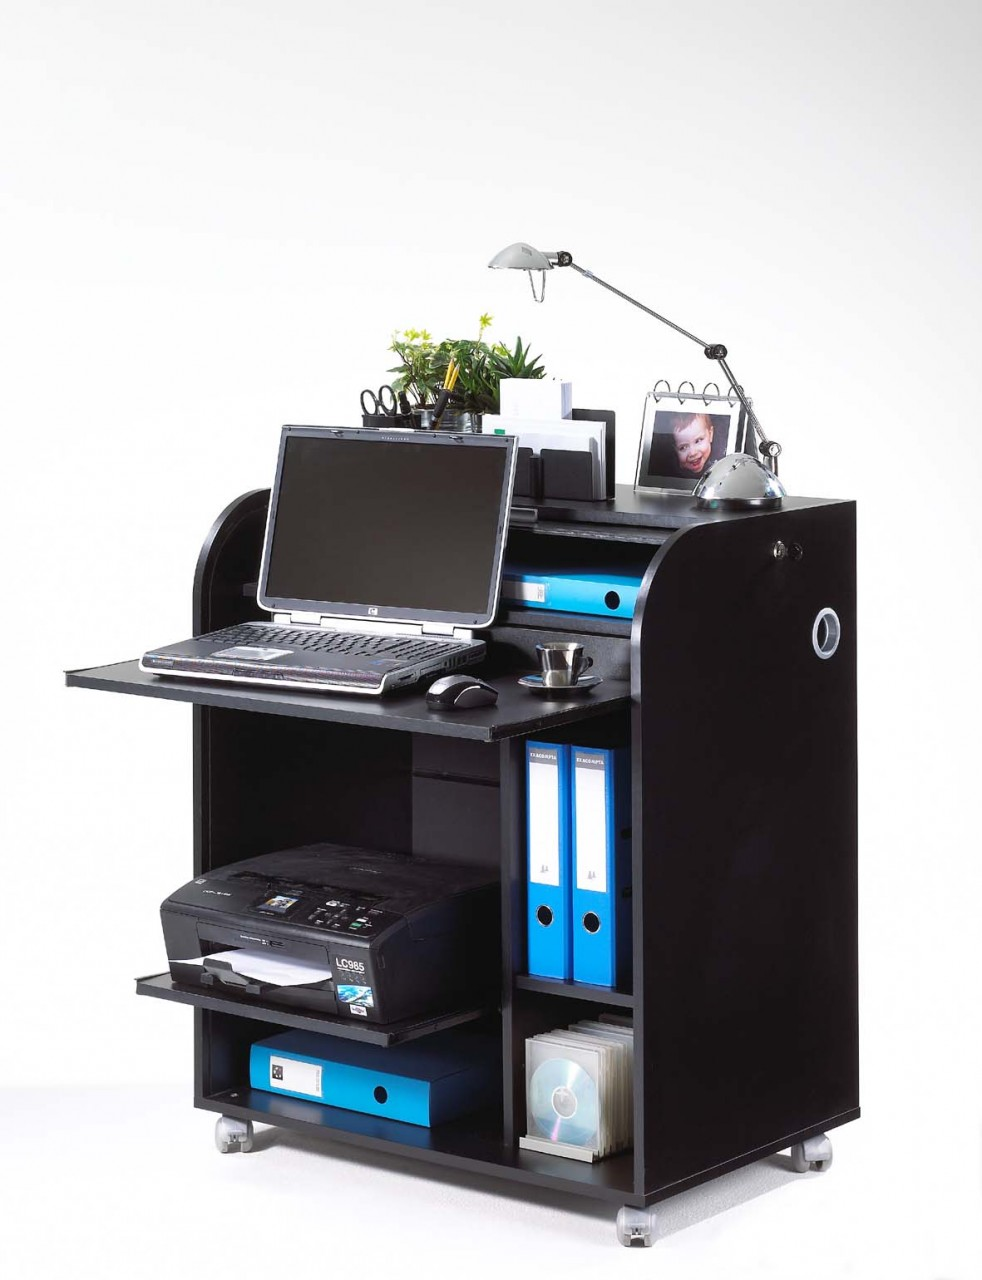 bureau nomade achat home offices 193 00. Black Bedroom Furniture Sets. Home Design Ideas